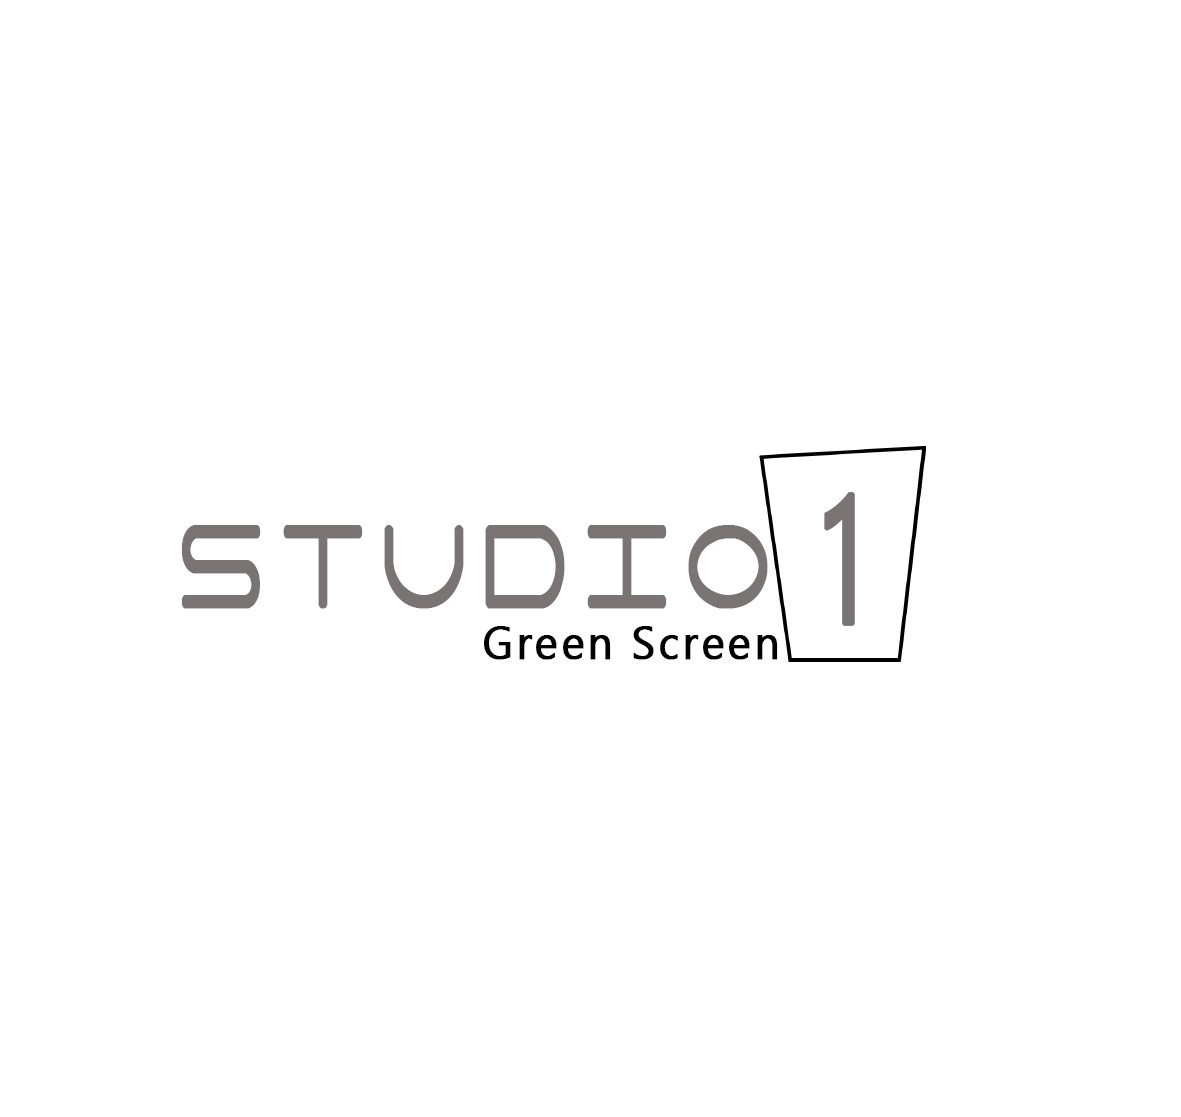 Studio%201%20name_edited